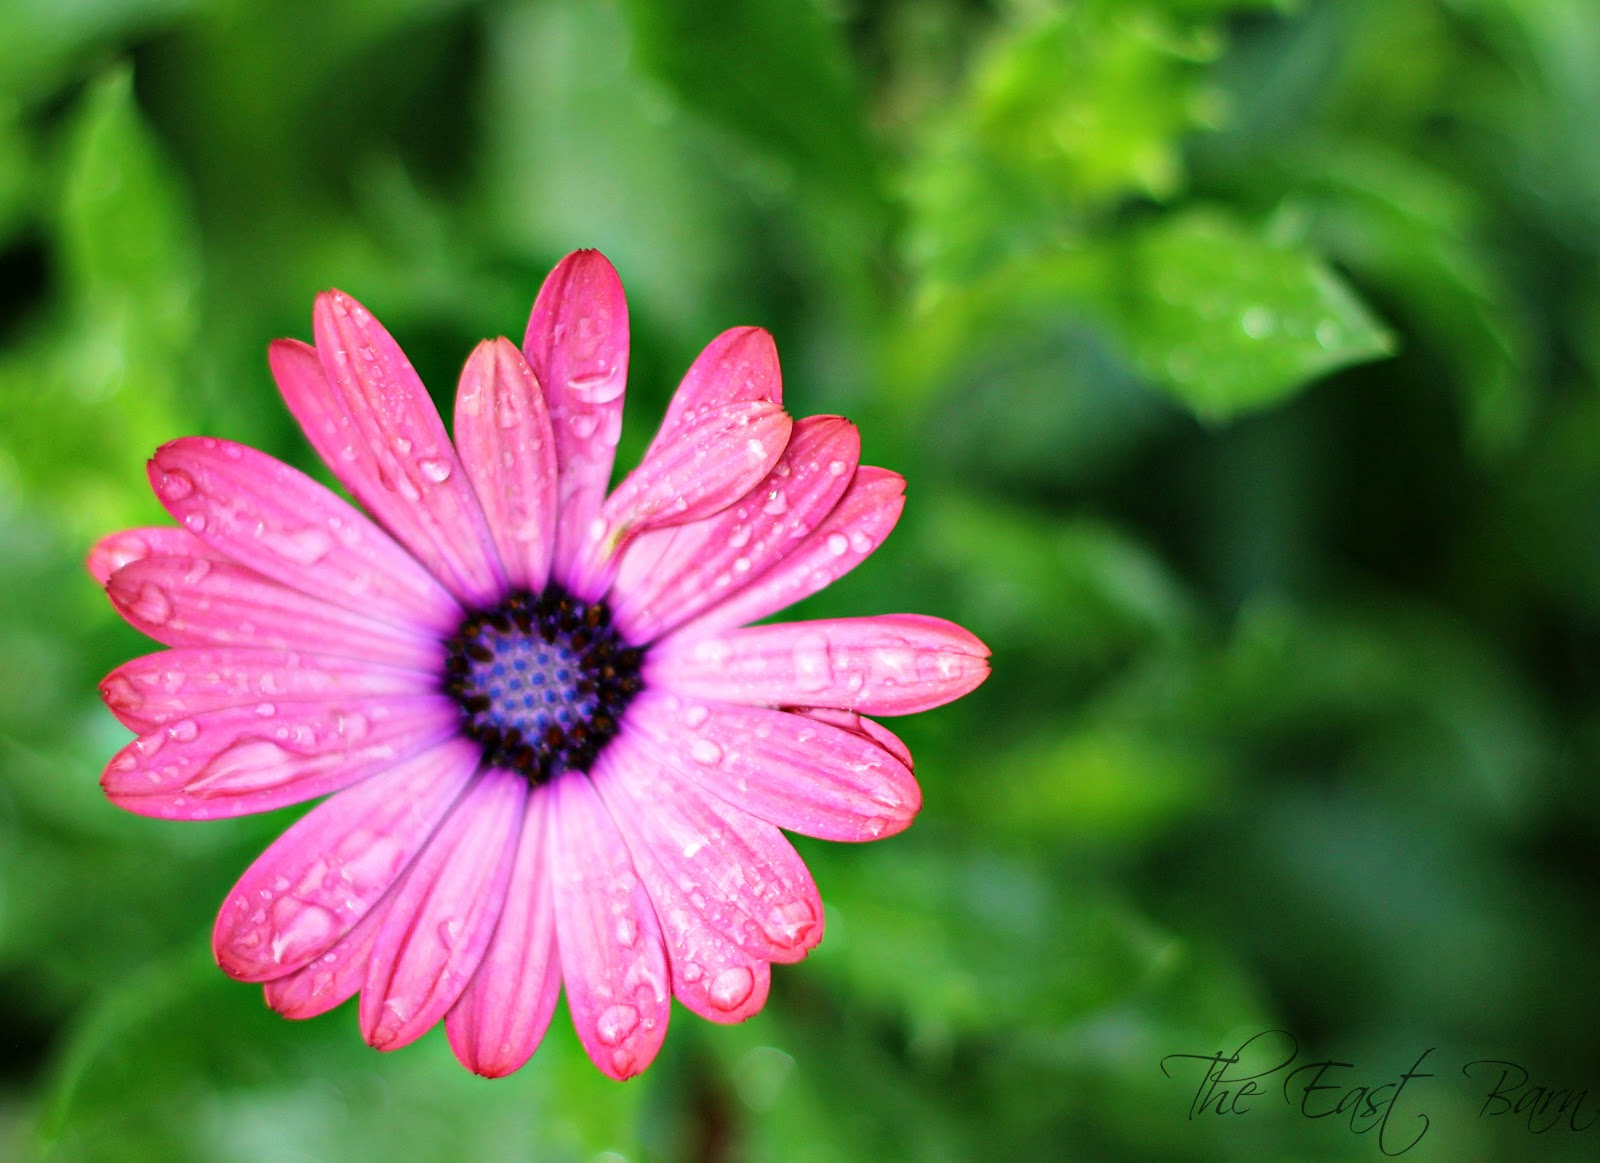 The East Barn Raindrops on Flowers